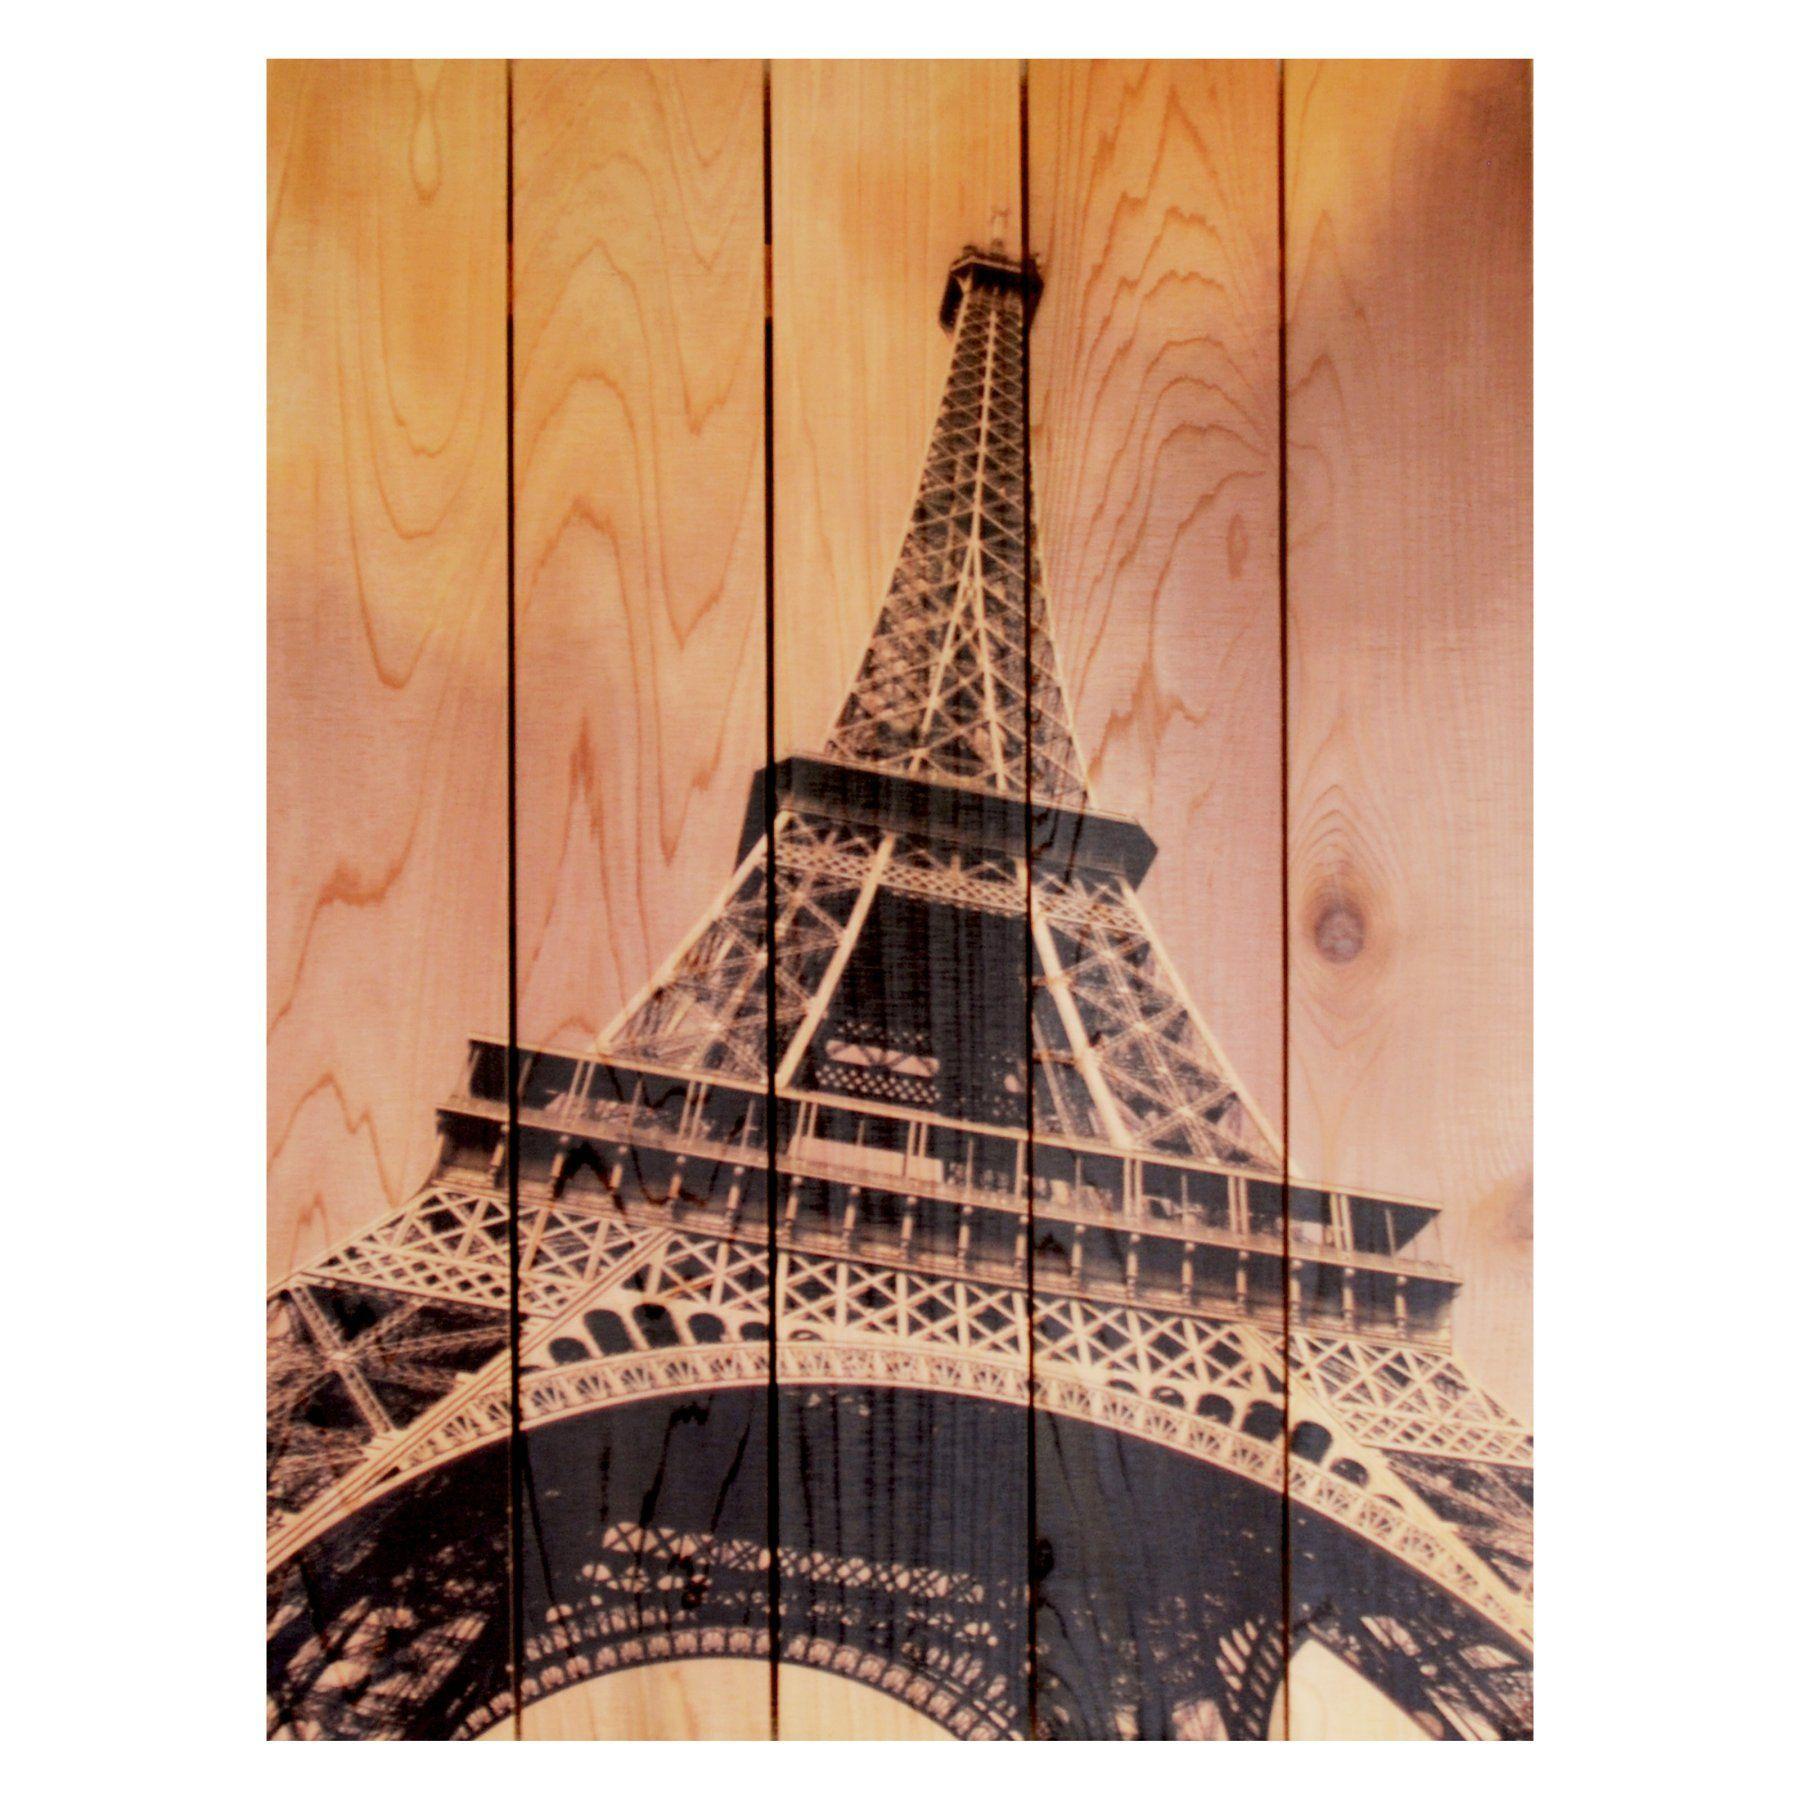 Gizaun art eiffel tower insideoutside full color cedar wall art